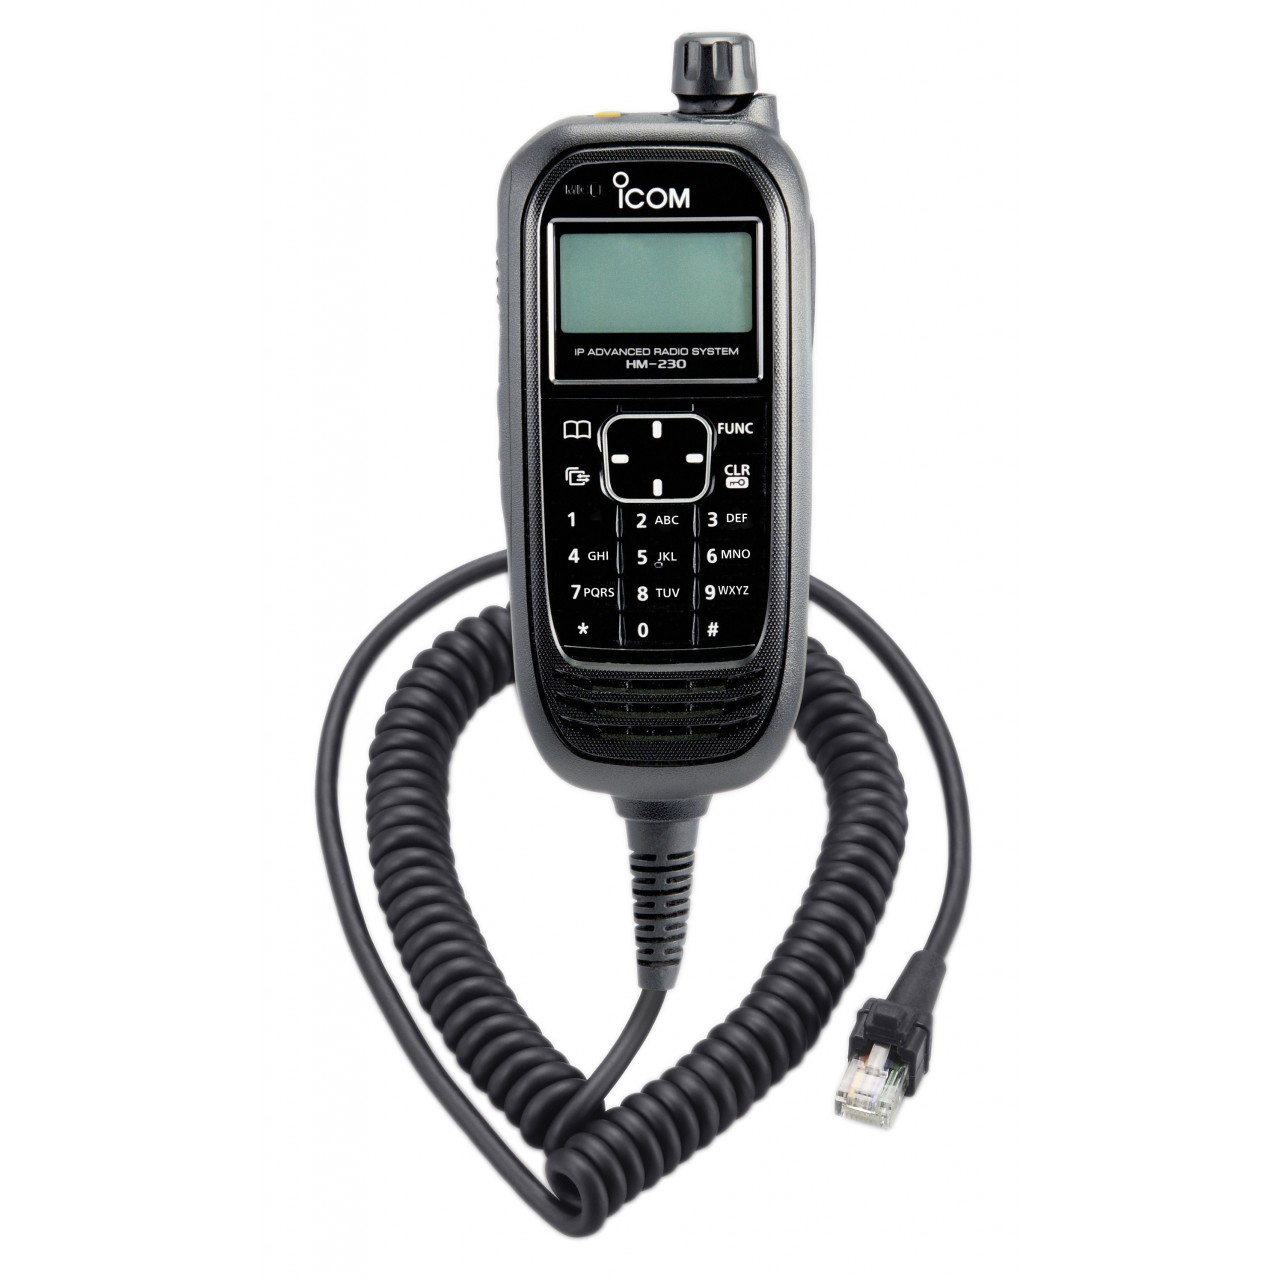 HM-230HB Microphones - ICOM